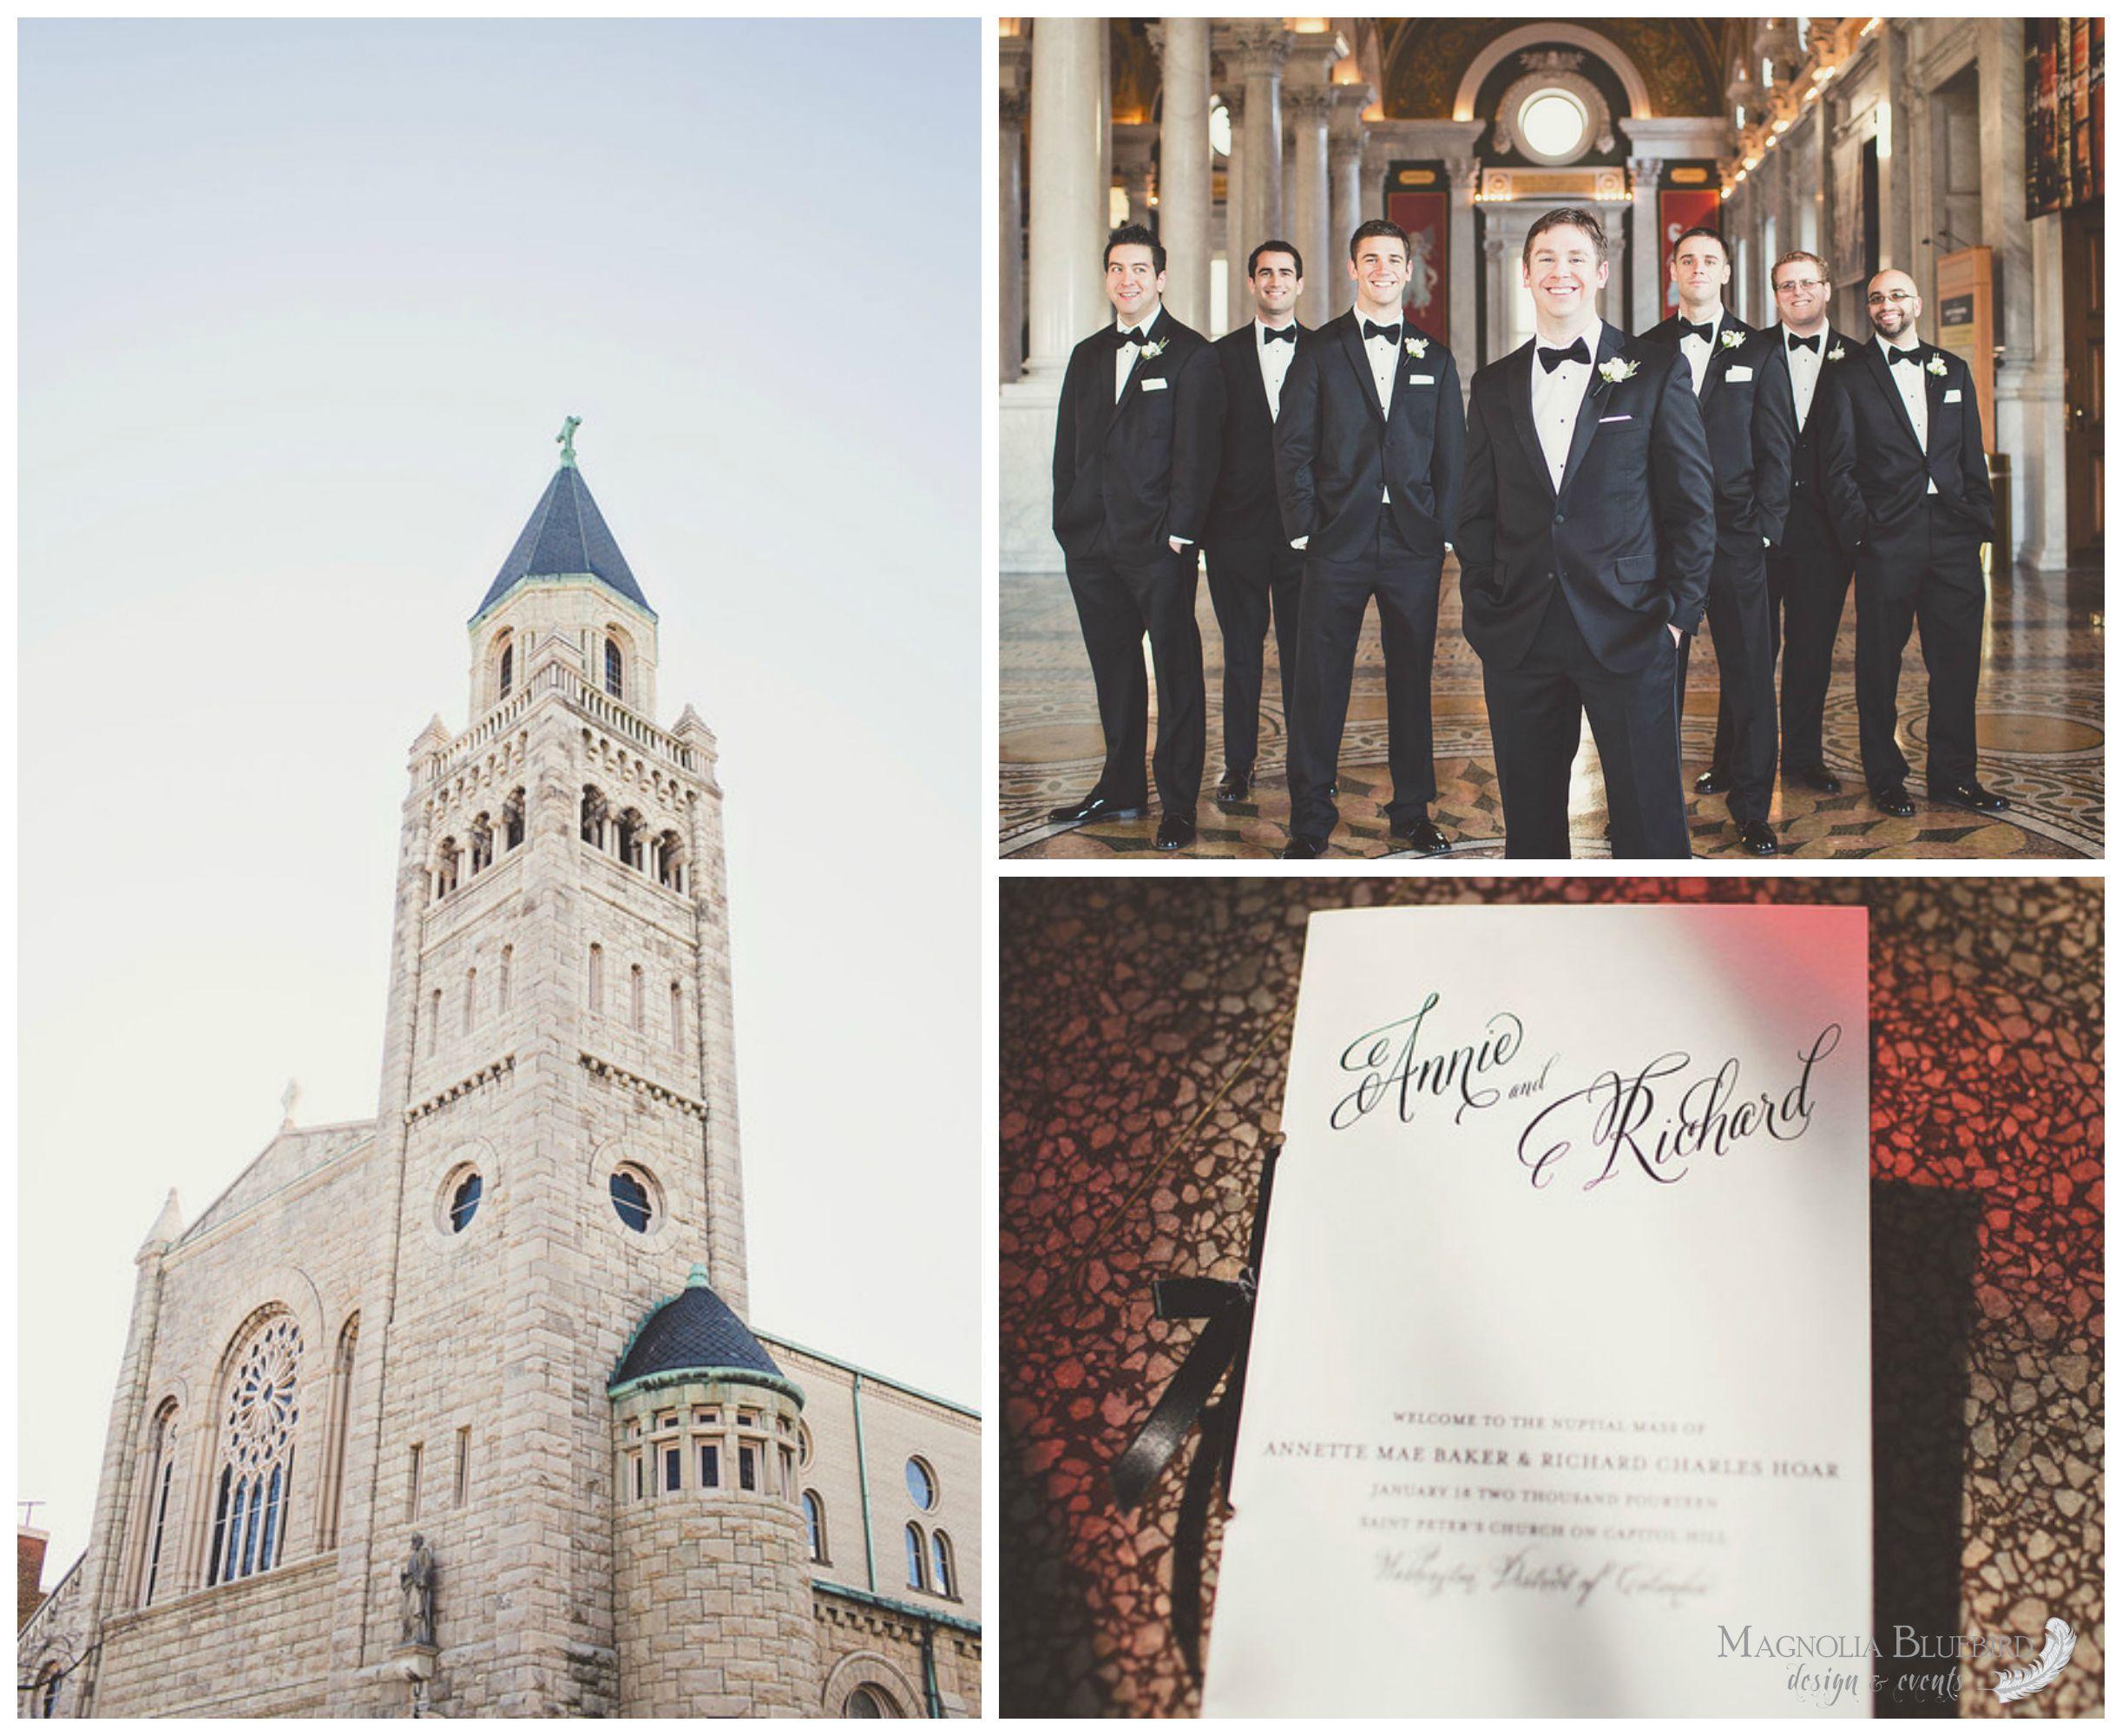 Church Ceremony | Groomsmen | Wedding Program | Classic | Elegant | Black and White | Magnolia Bluebird | Real Wedding | The Four Seasons, Washington DC